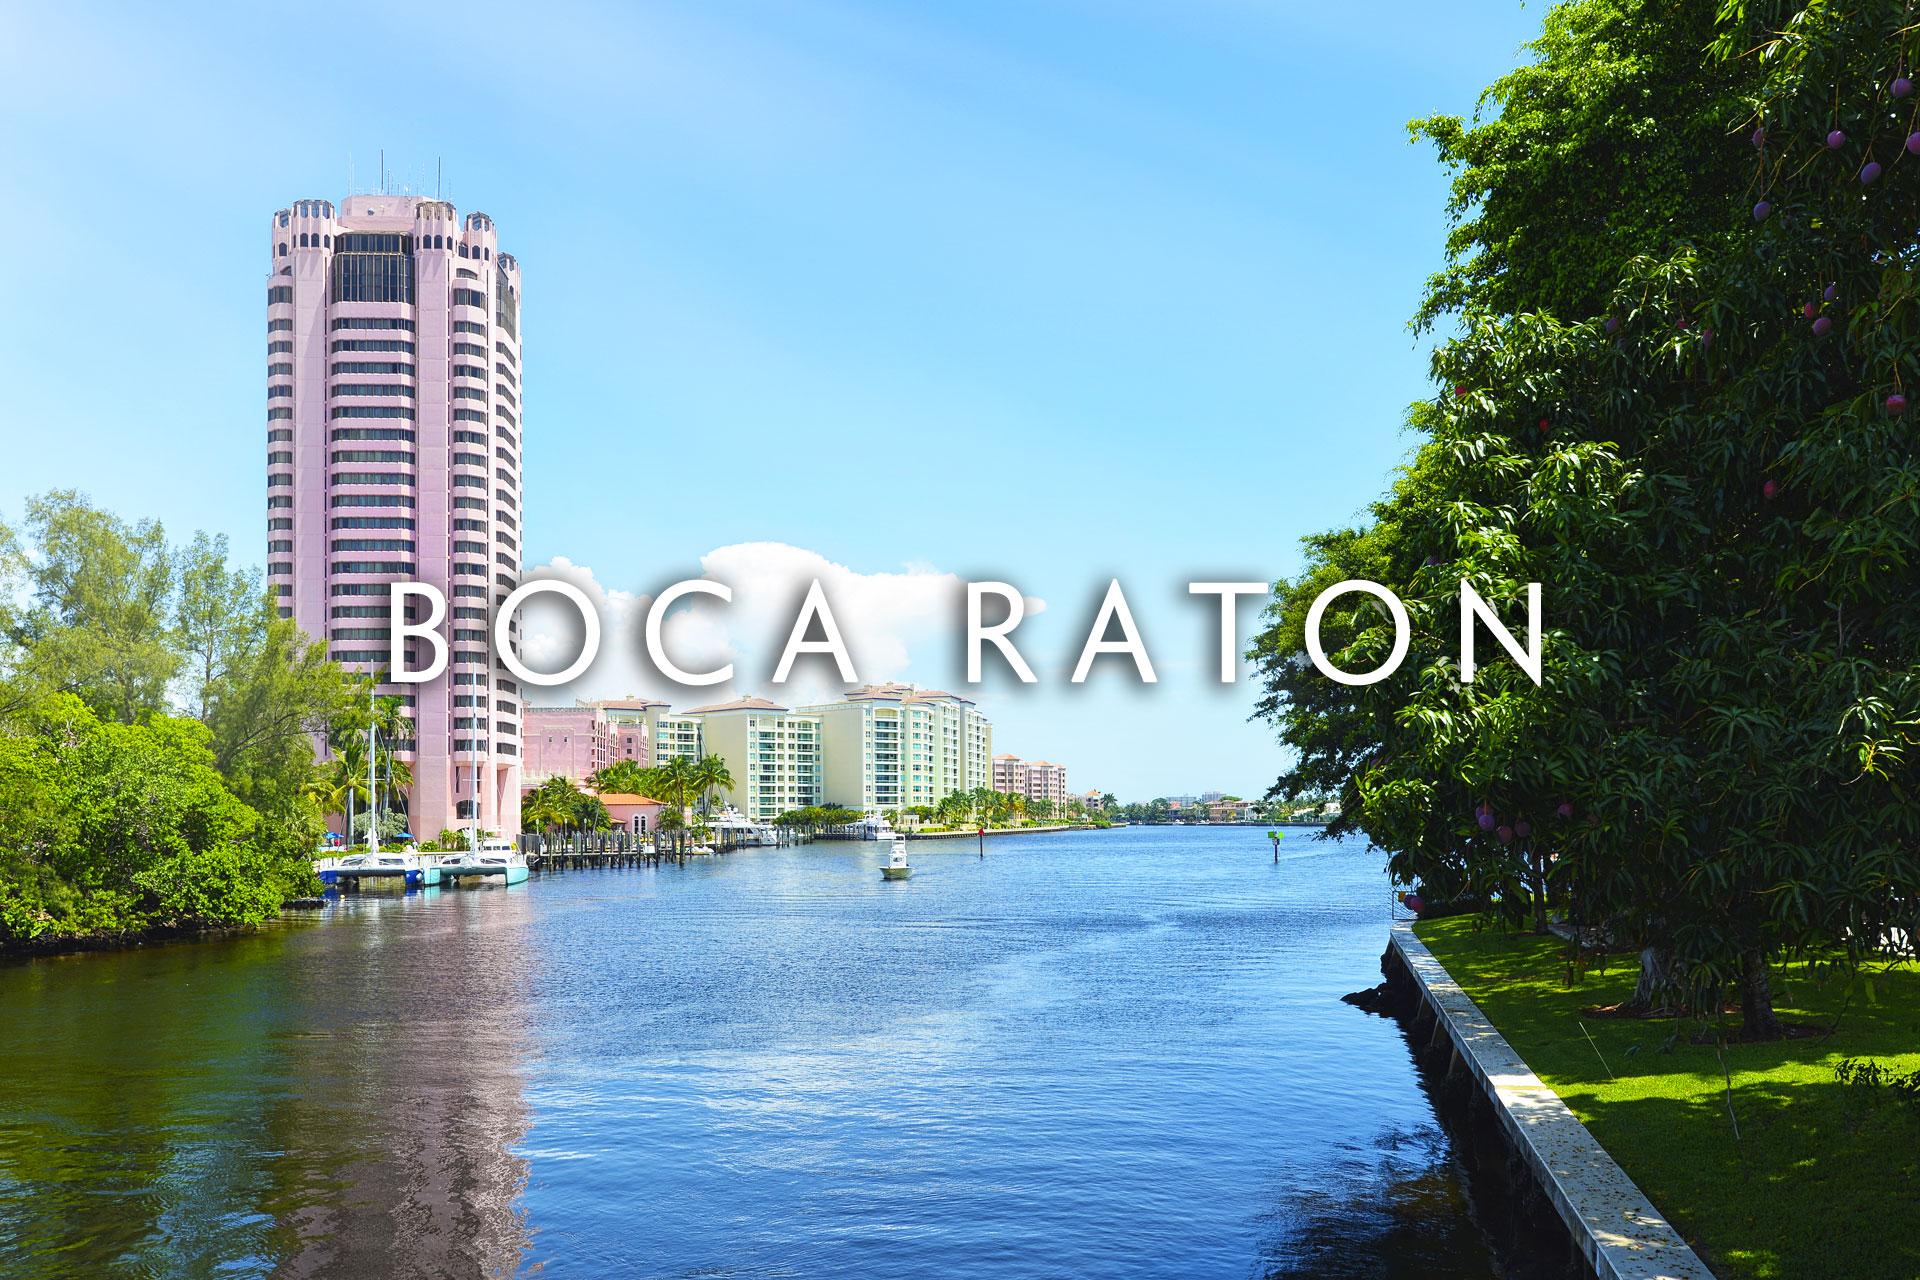 Boca Raton Oceanway with condo building in distance